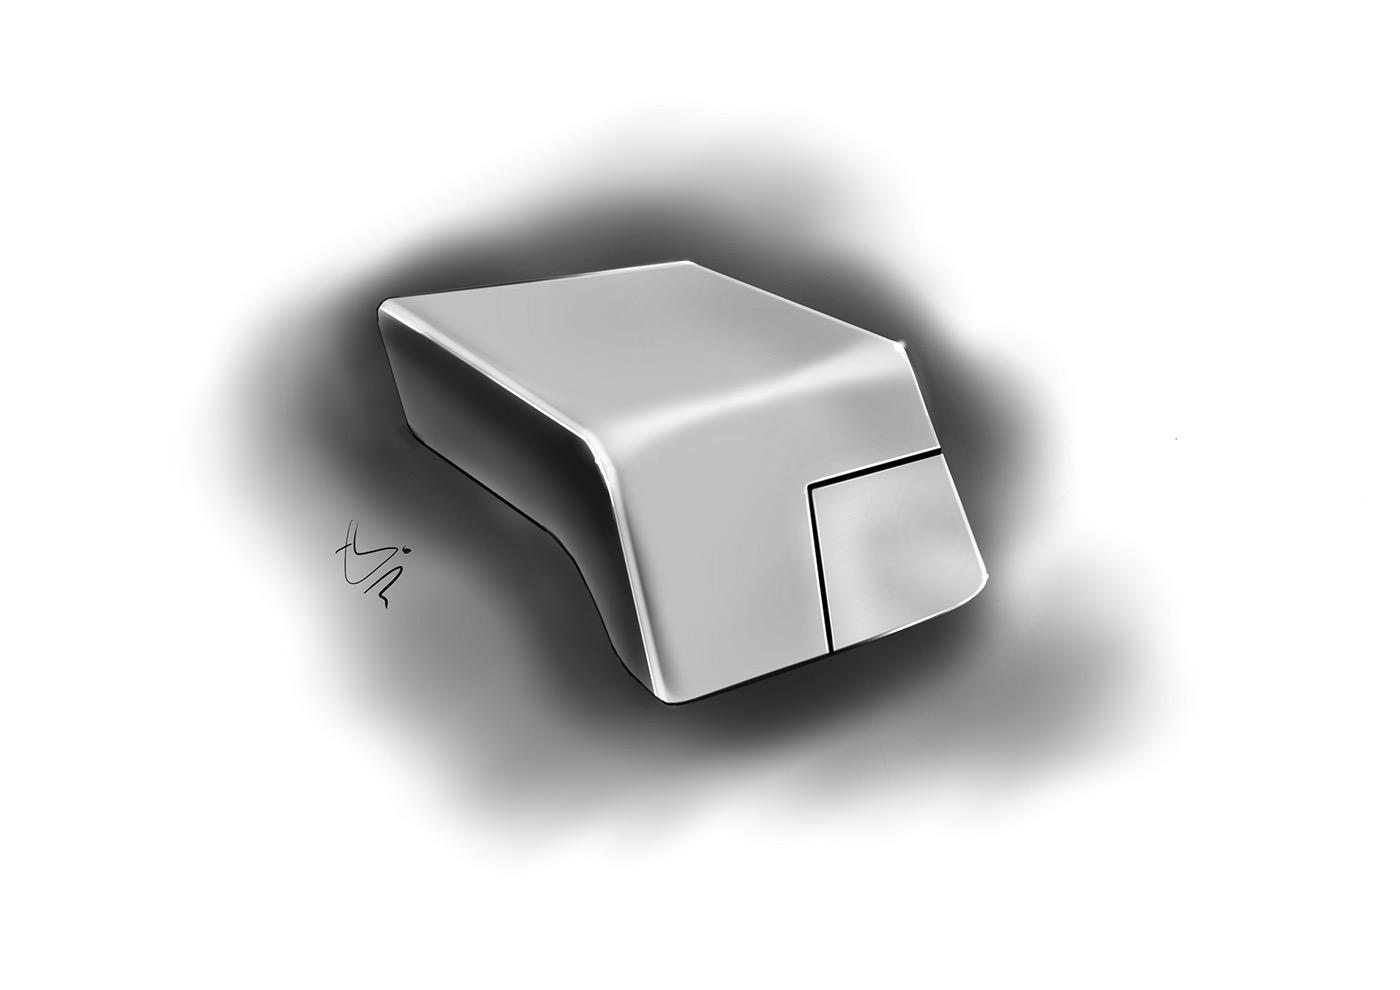 sketching Sketche wacom